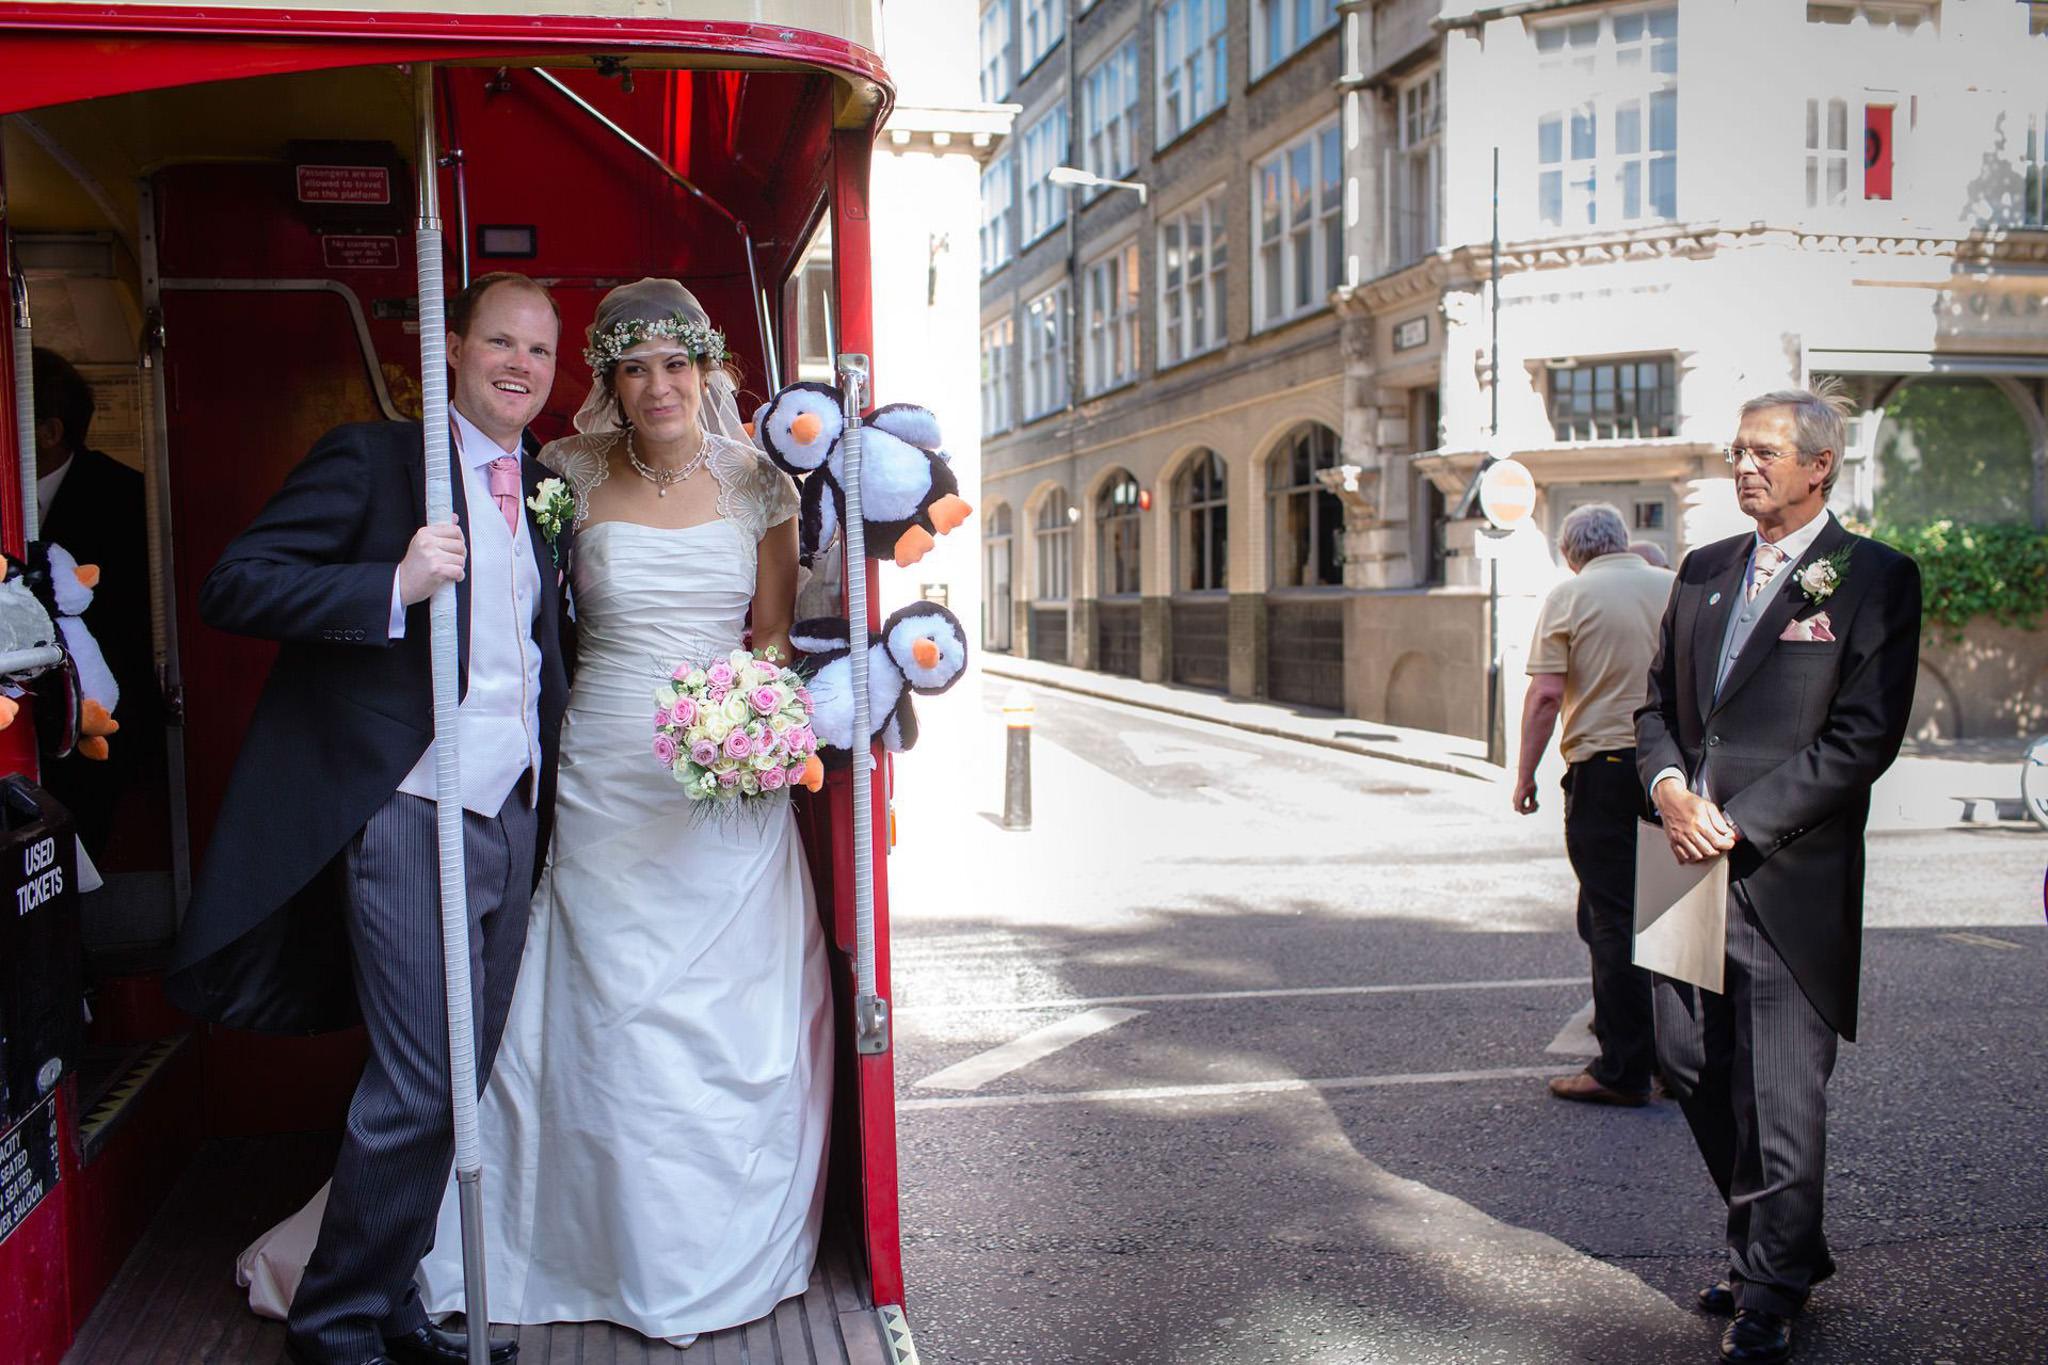 St. Pancras hotel wedding couple on the bus